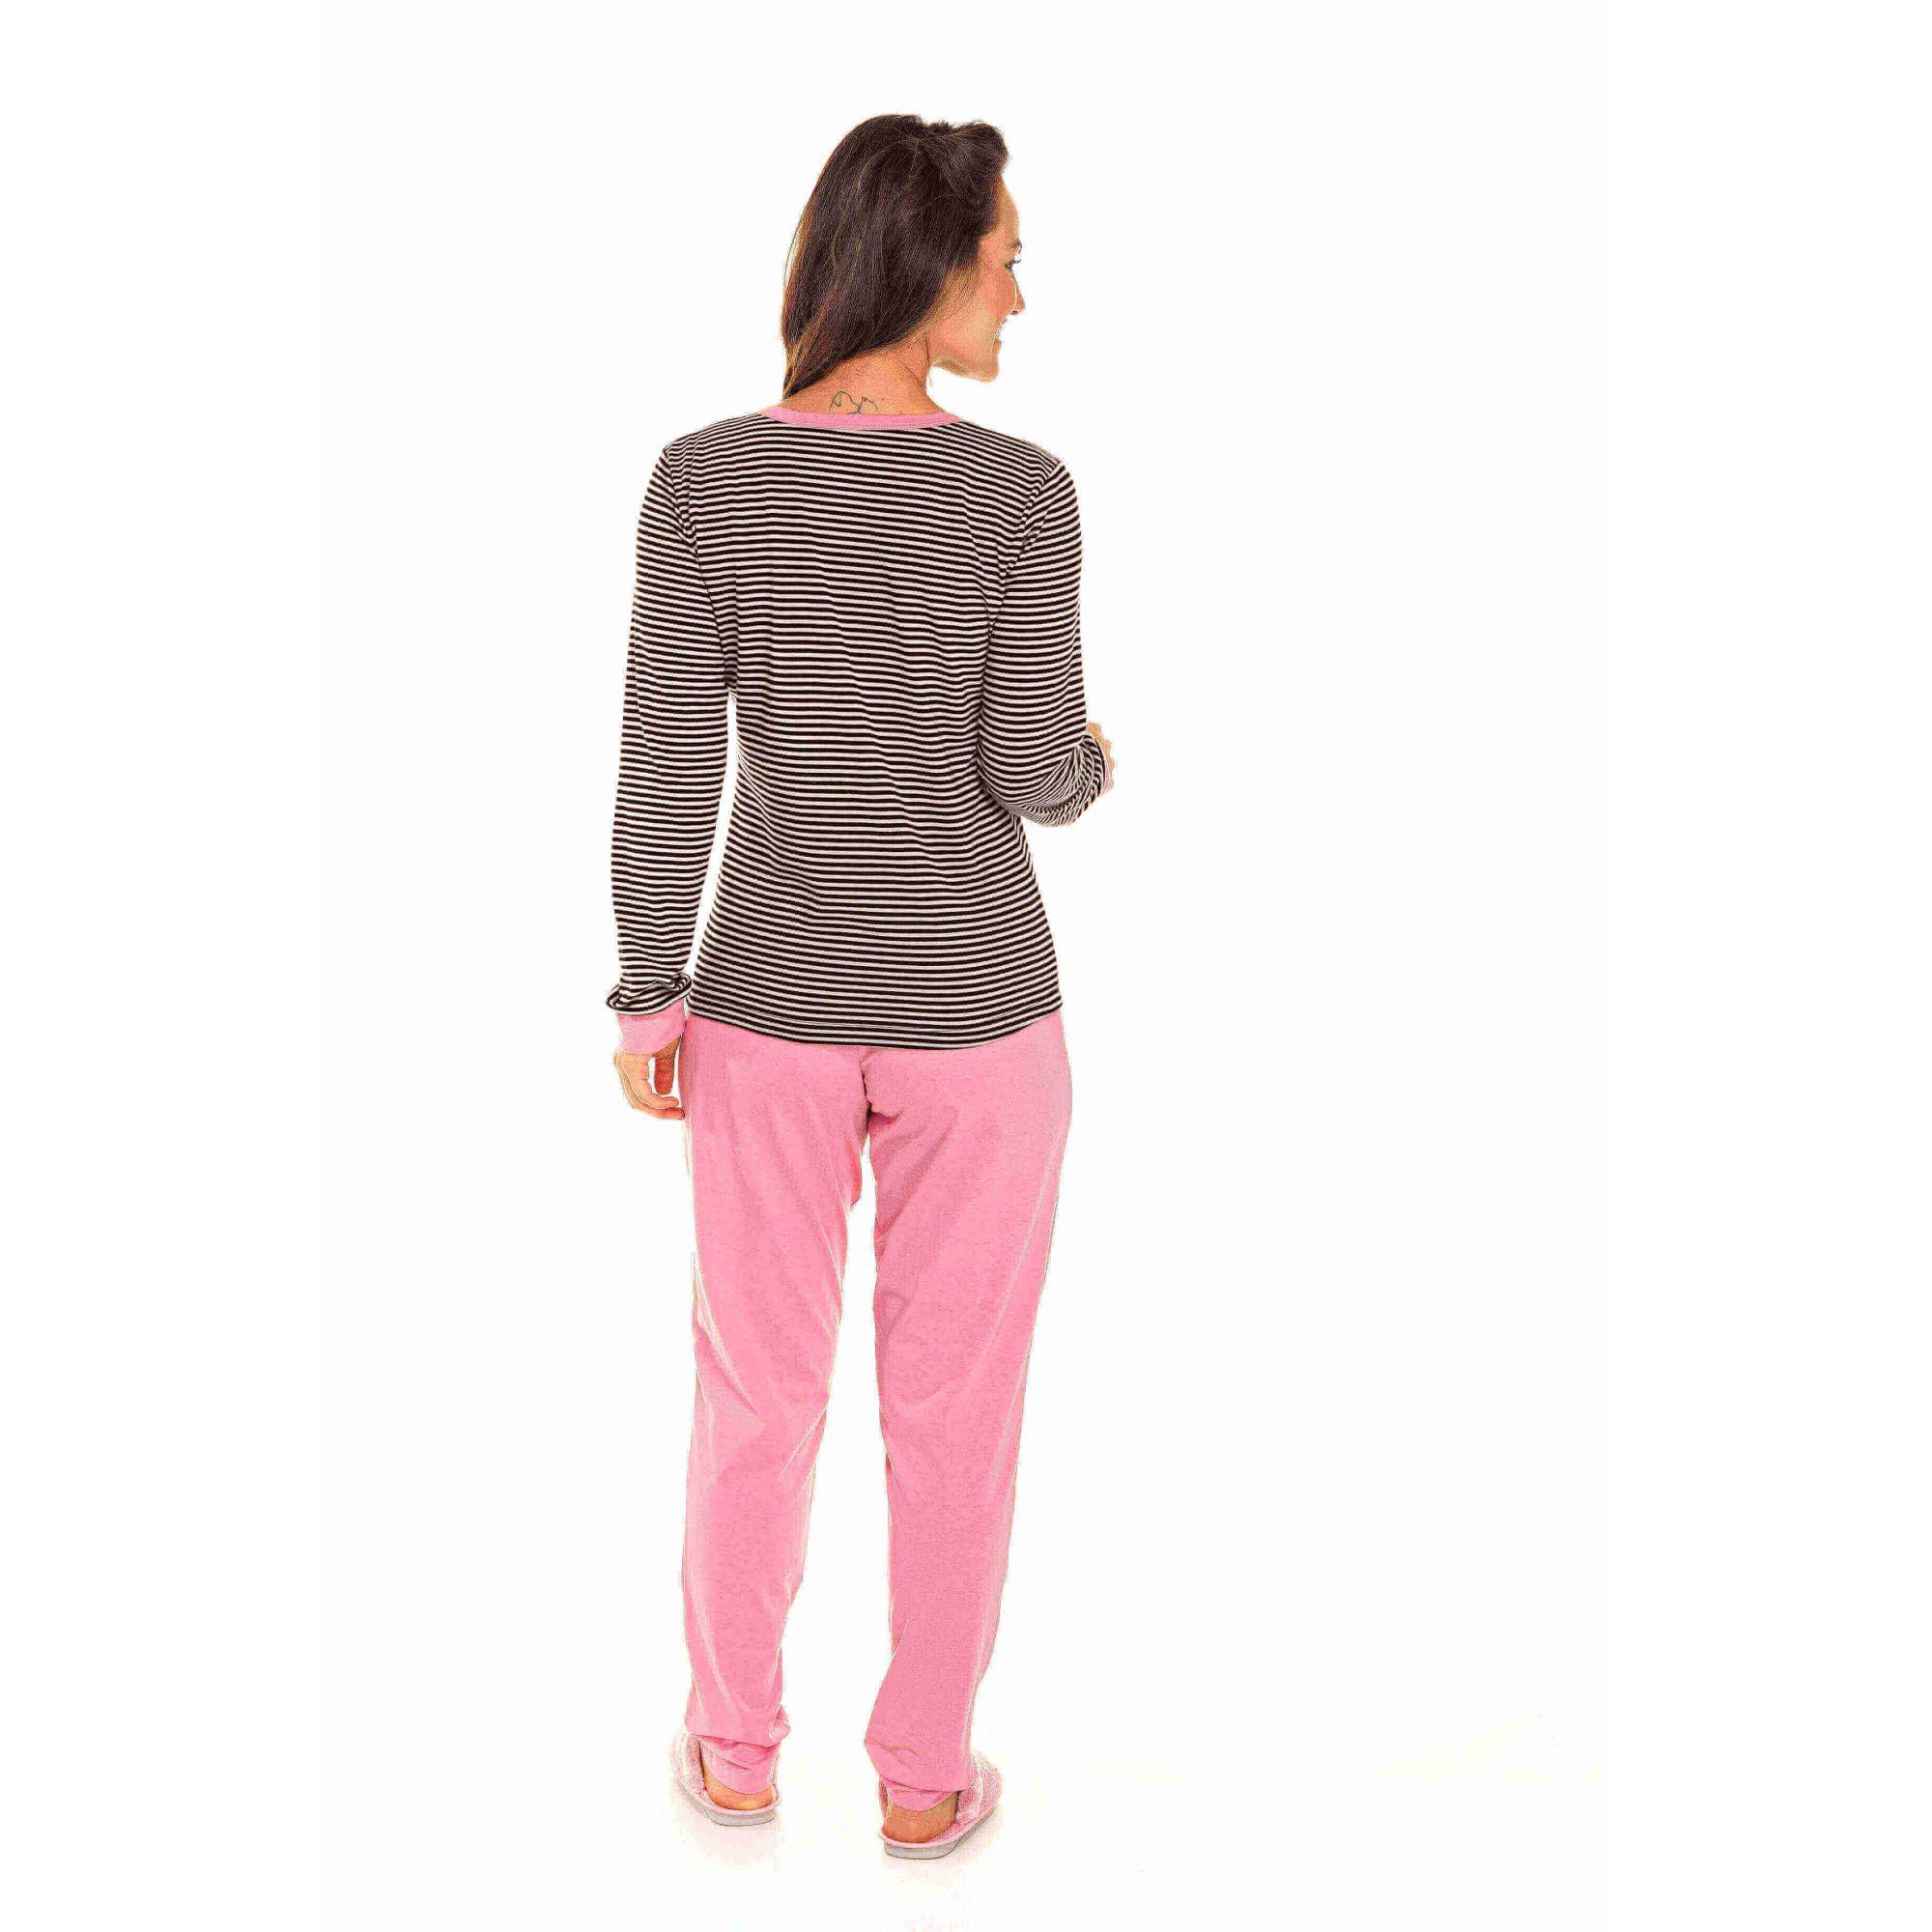 Pijama Adulto Feminino Aberto Listrado Rosa